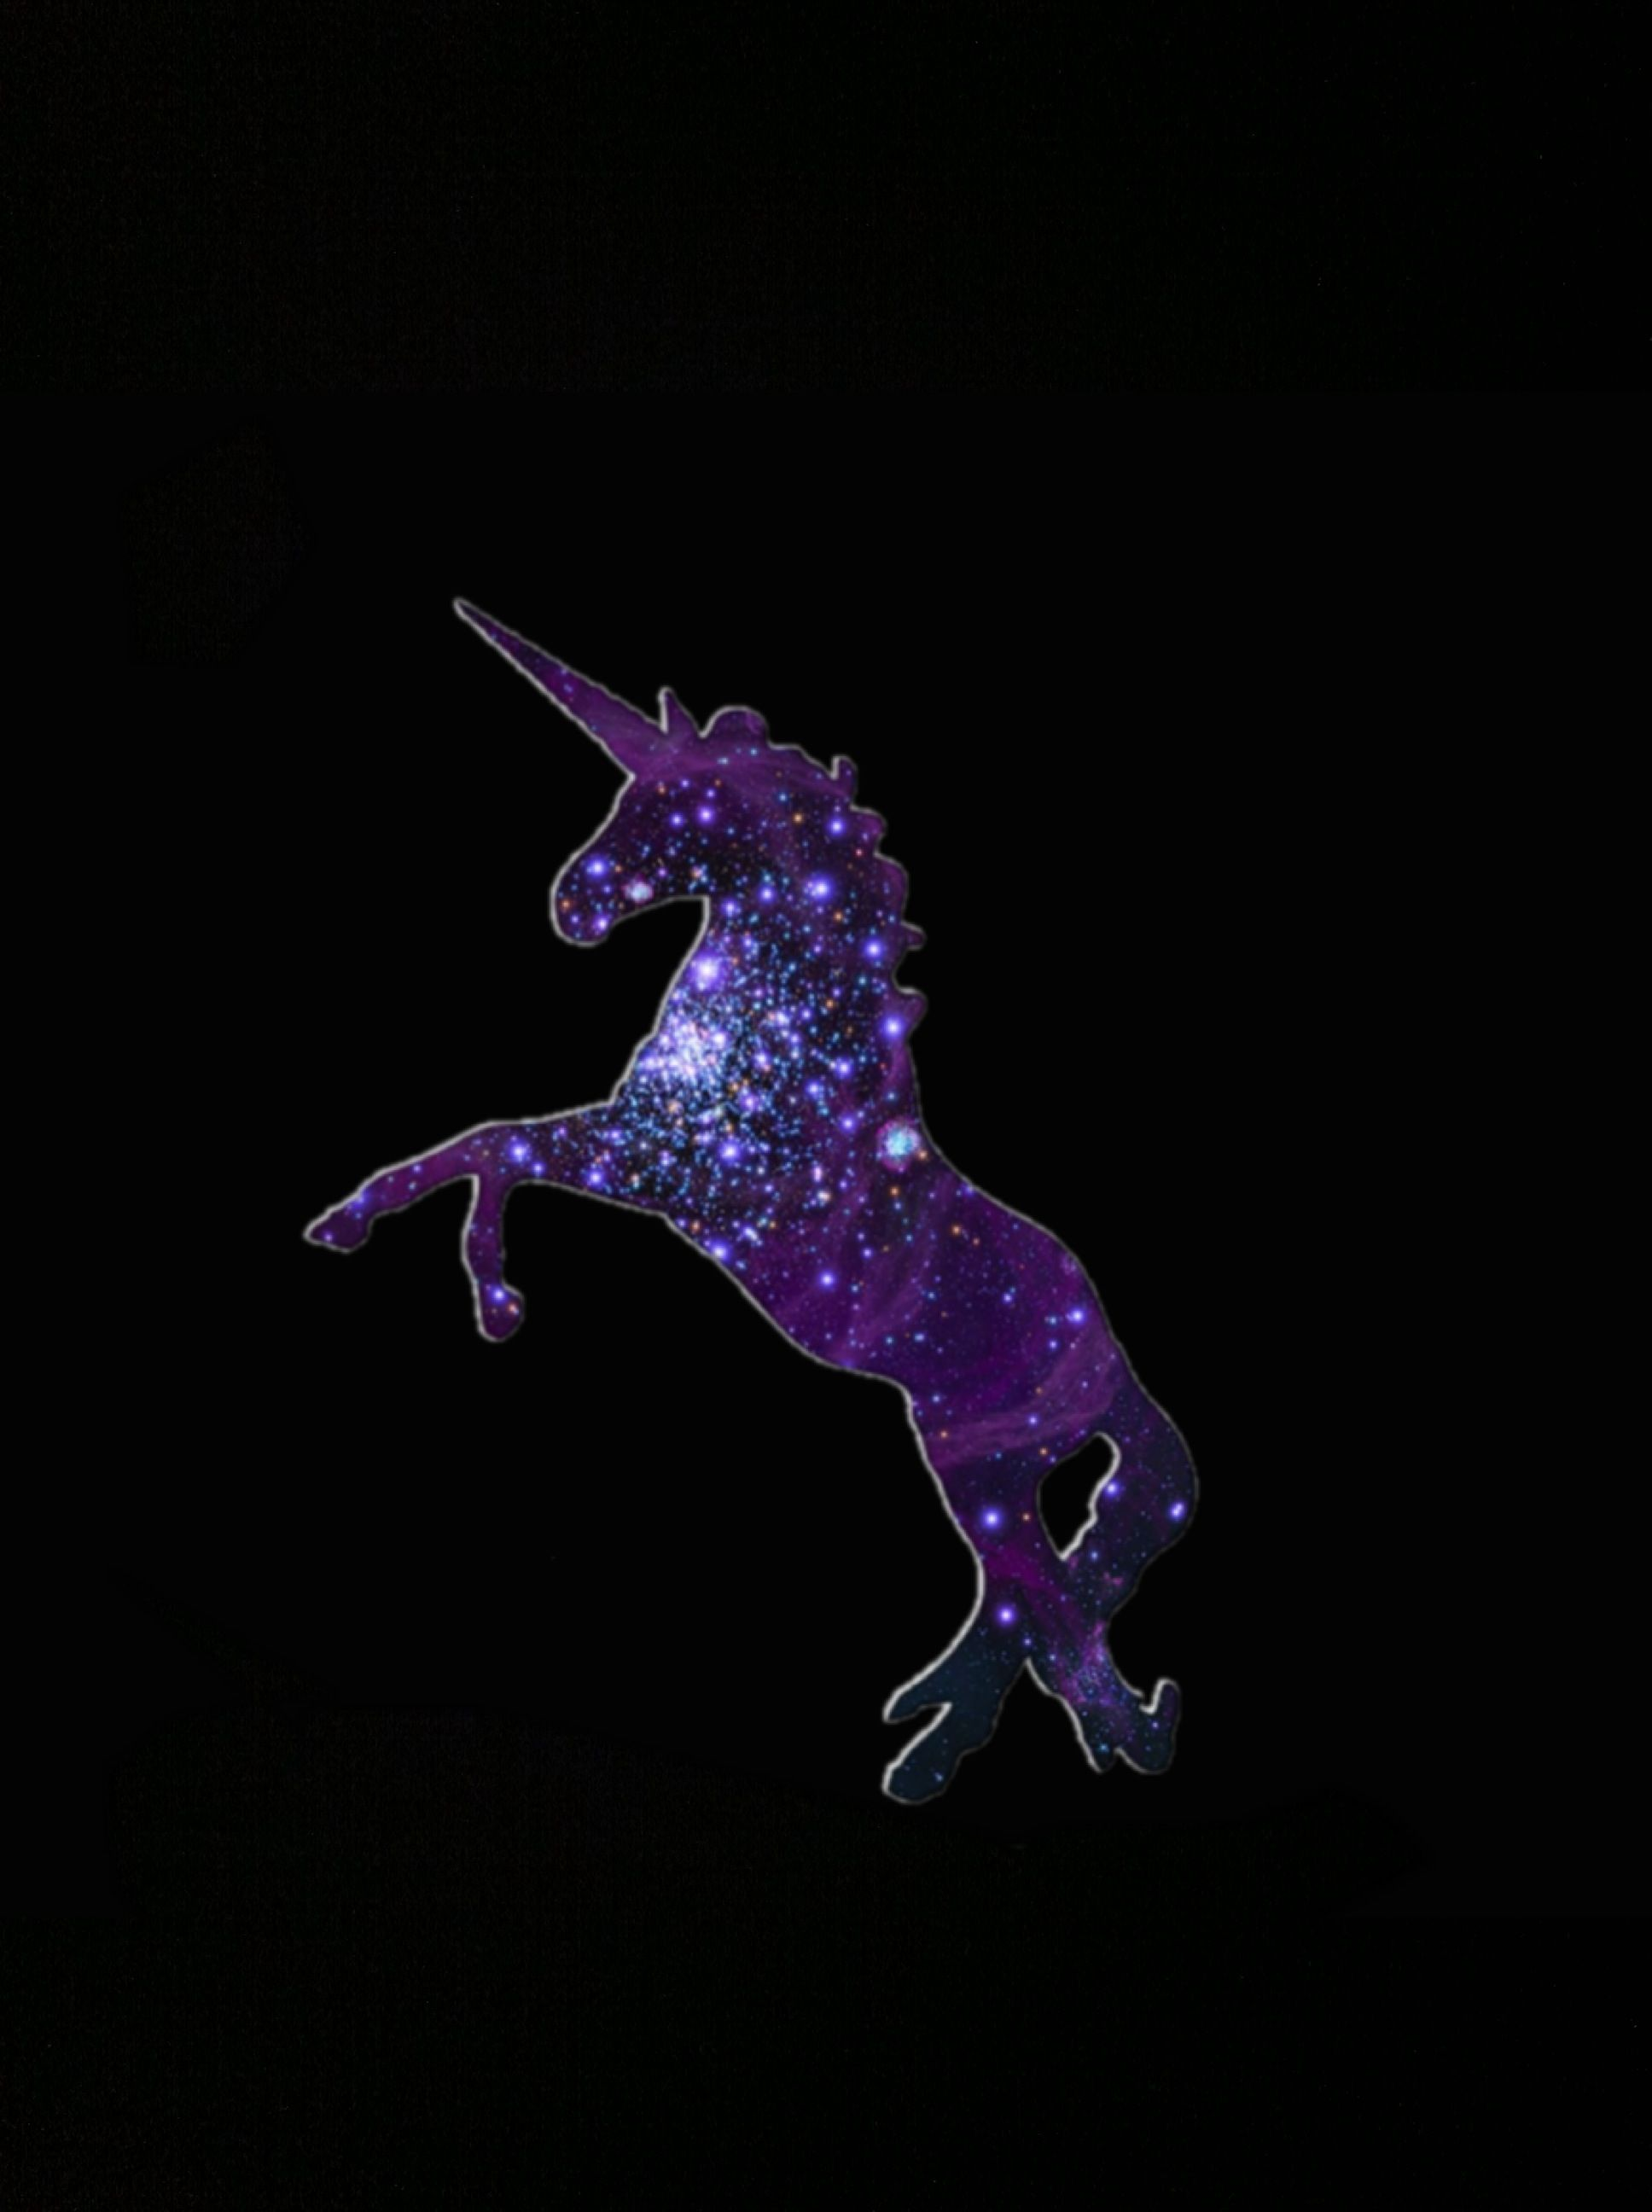 Unicorn galaxy background | iPod/iPhone Backgrounds | Pinterest | Iphone wallpaper unicorn ...